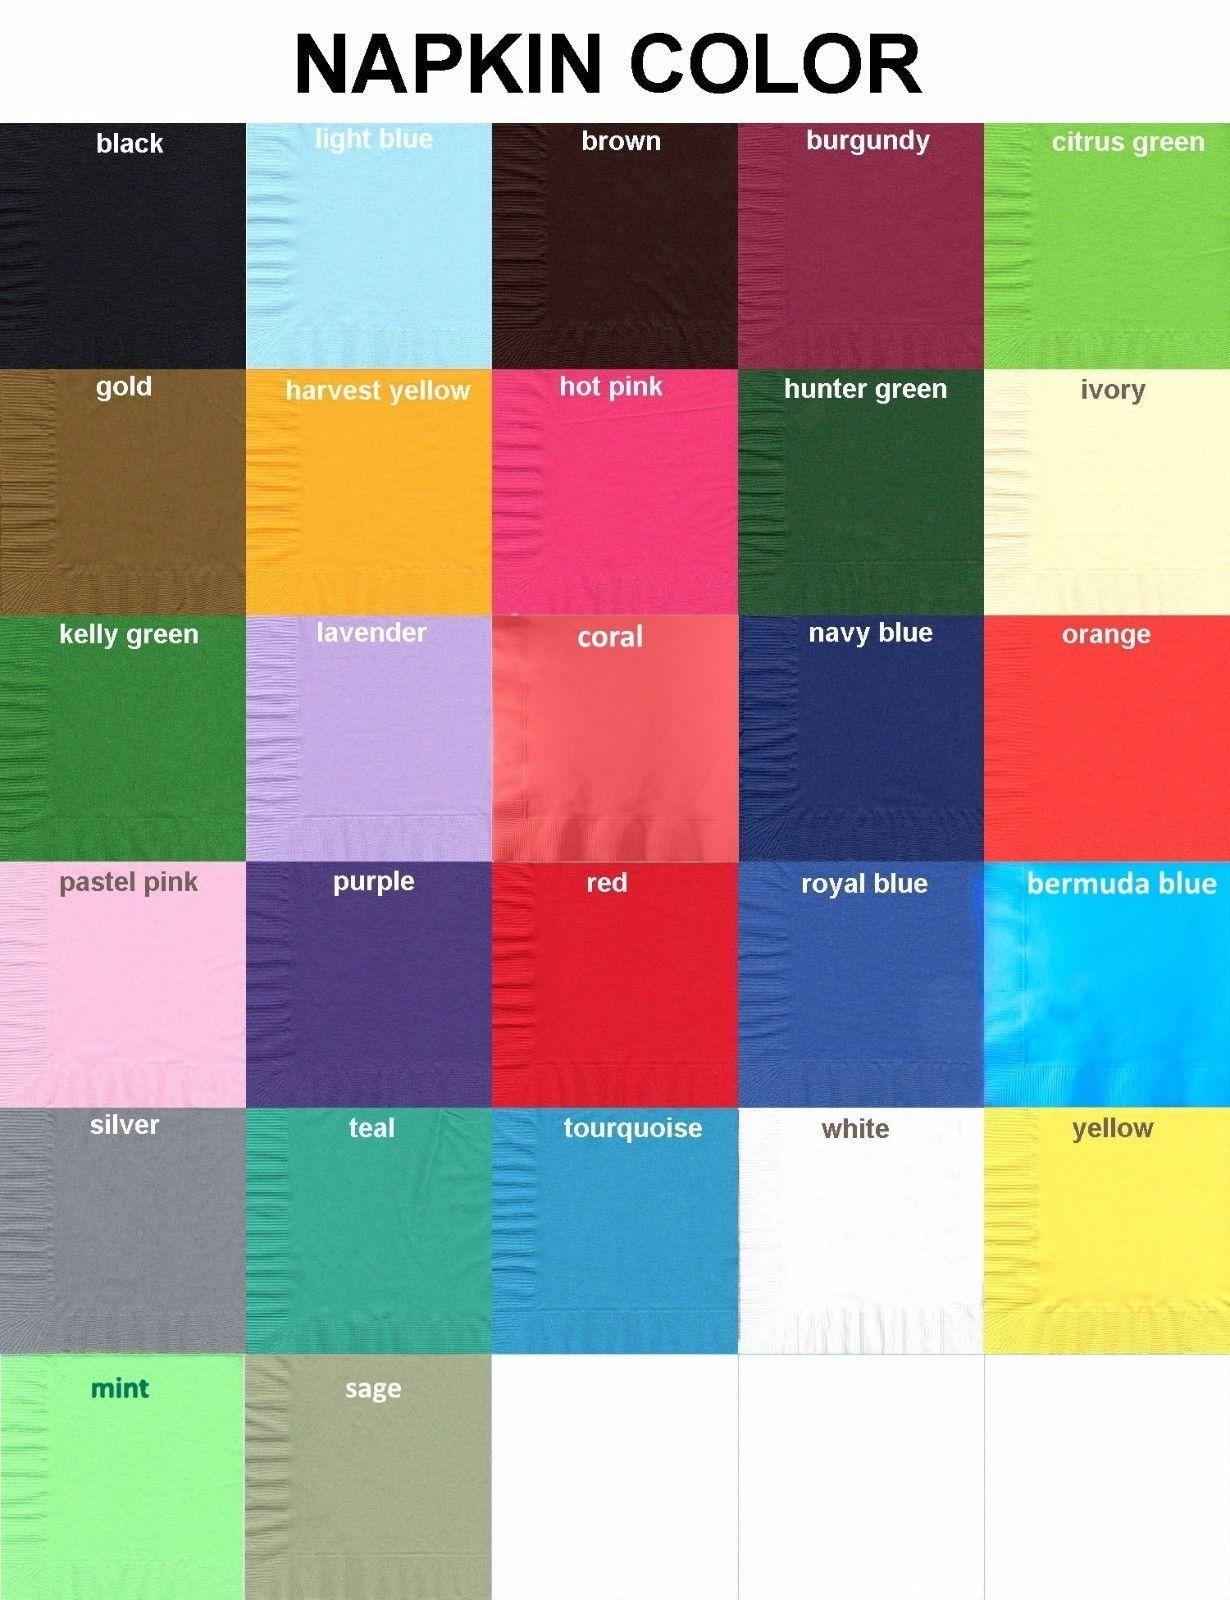 50 Plain Solid Colors Luncheon Dinner Napkins Paper - Cobalt/Royal Blue